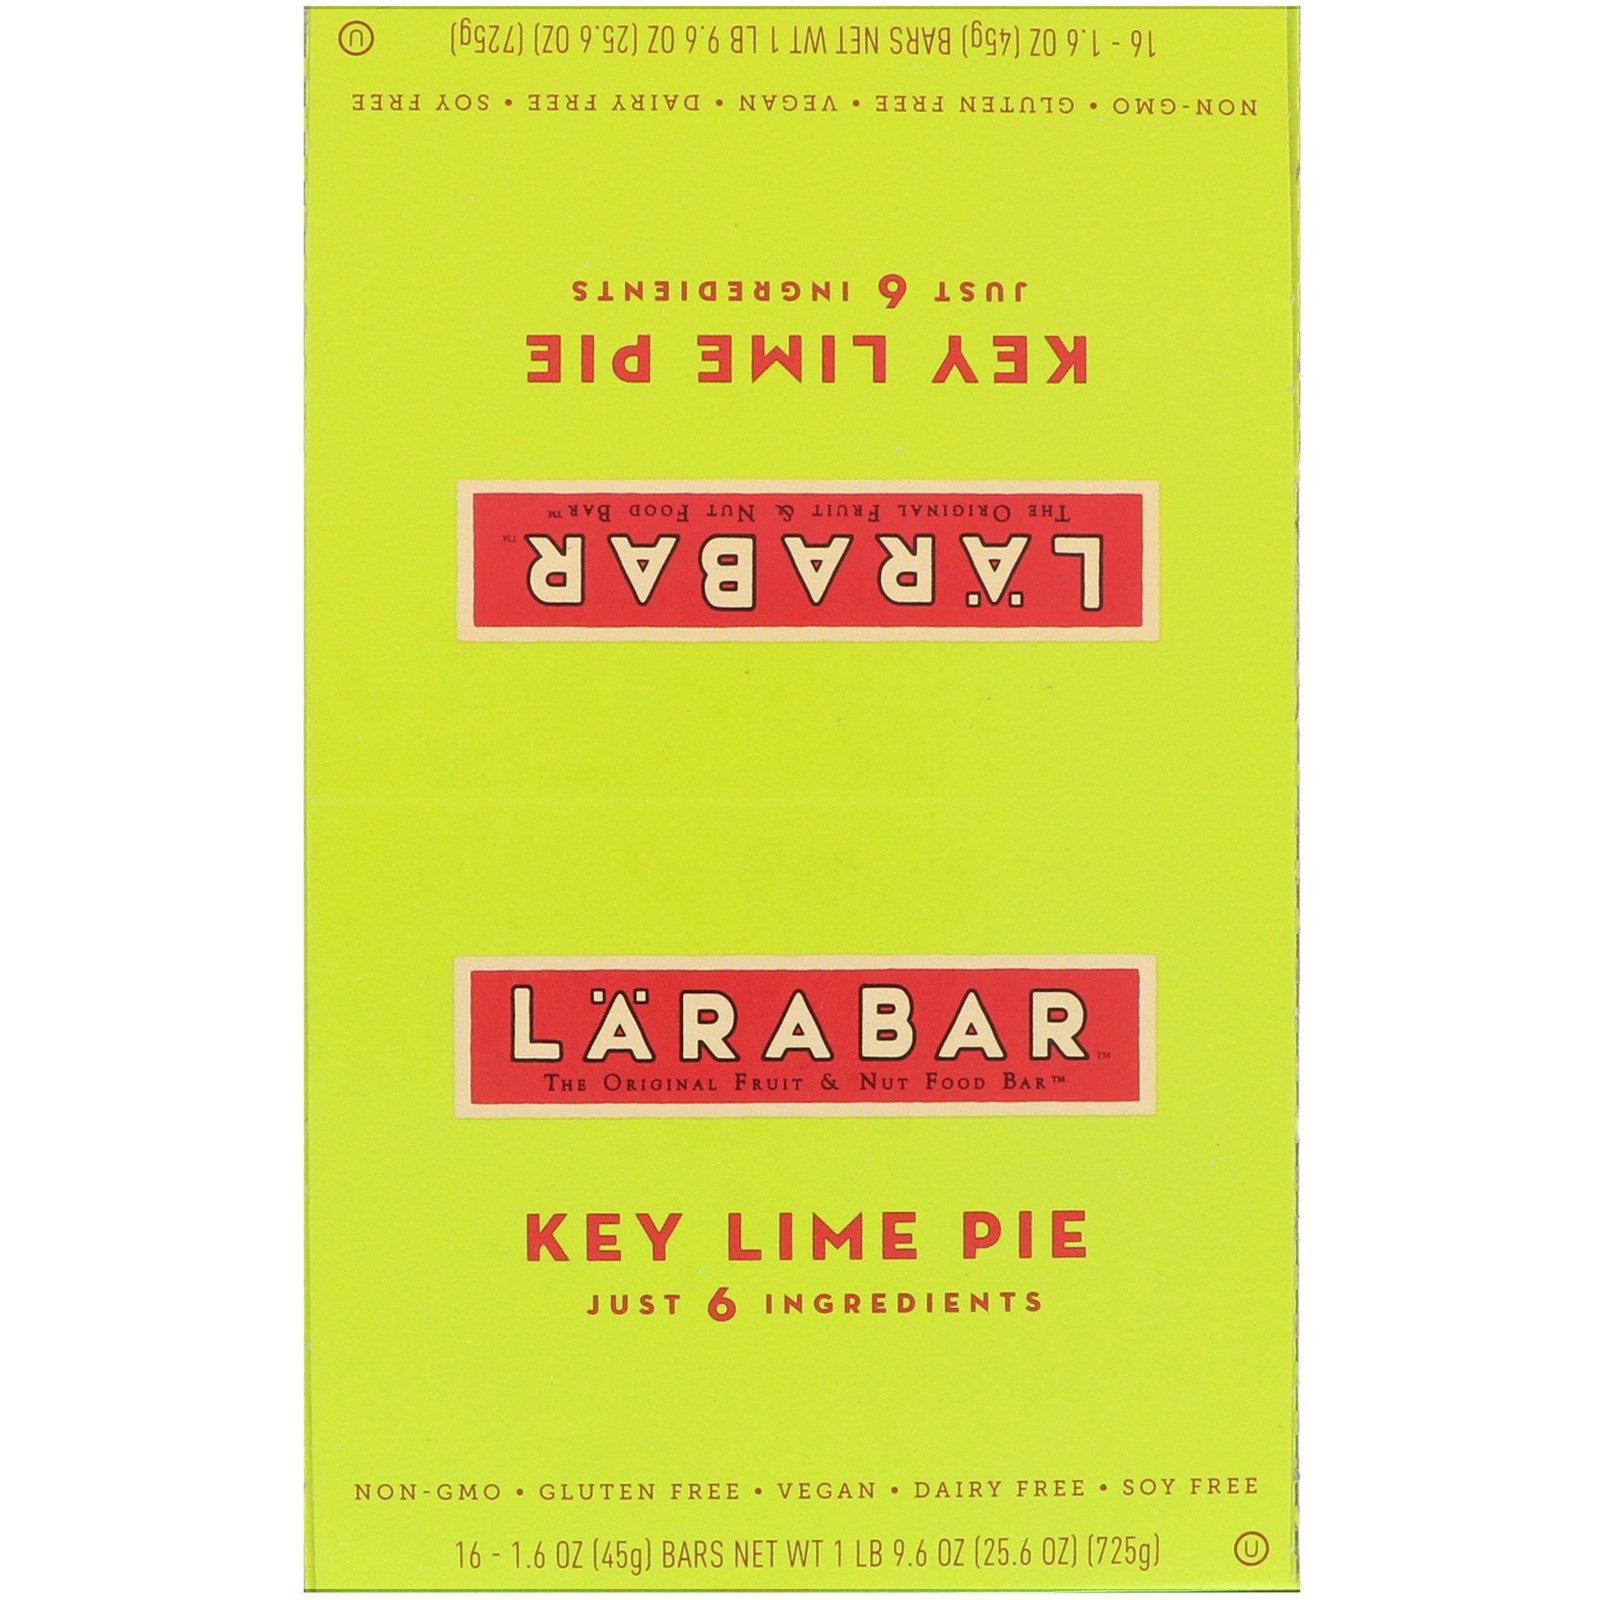 Larabar, Лаймовый пирог, 16 батончиков, 1,6 унции (45 г) каждый